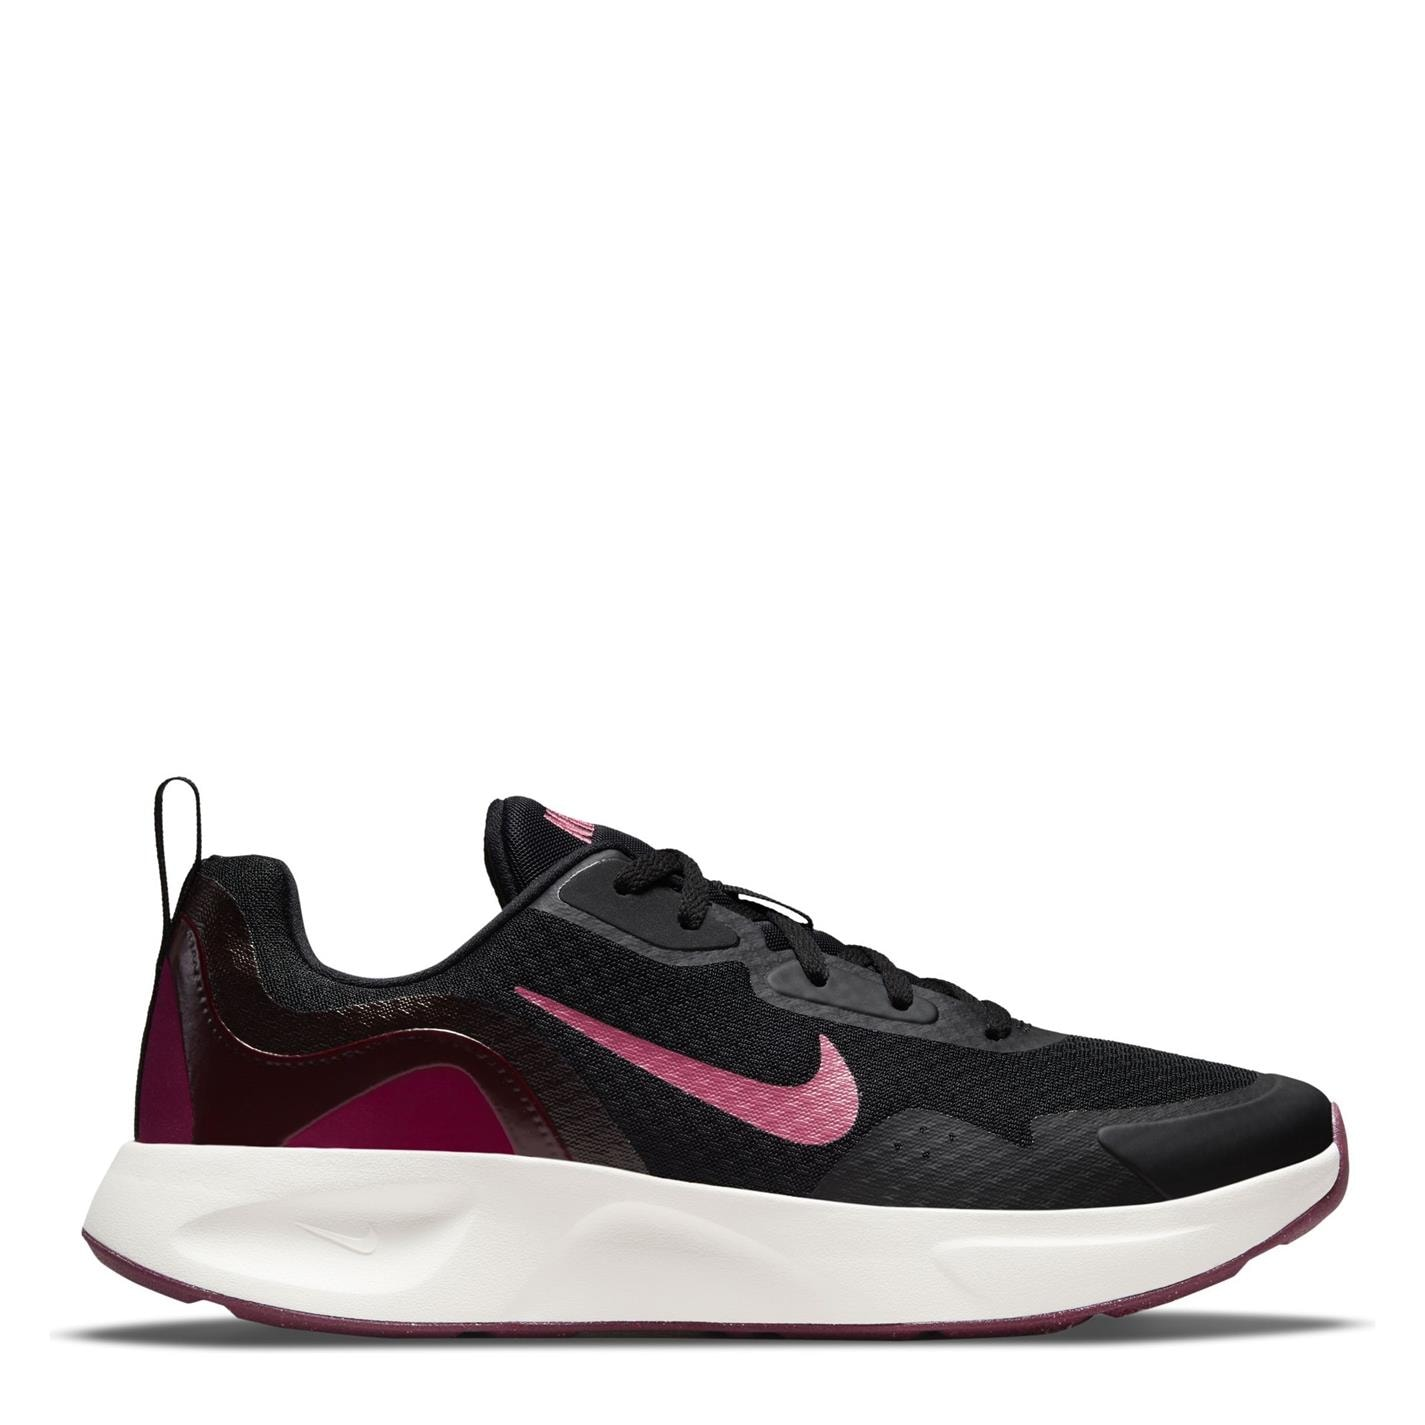 Adidasi sport Nike Wearallday pentru femei negru roz